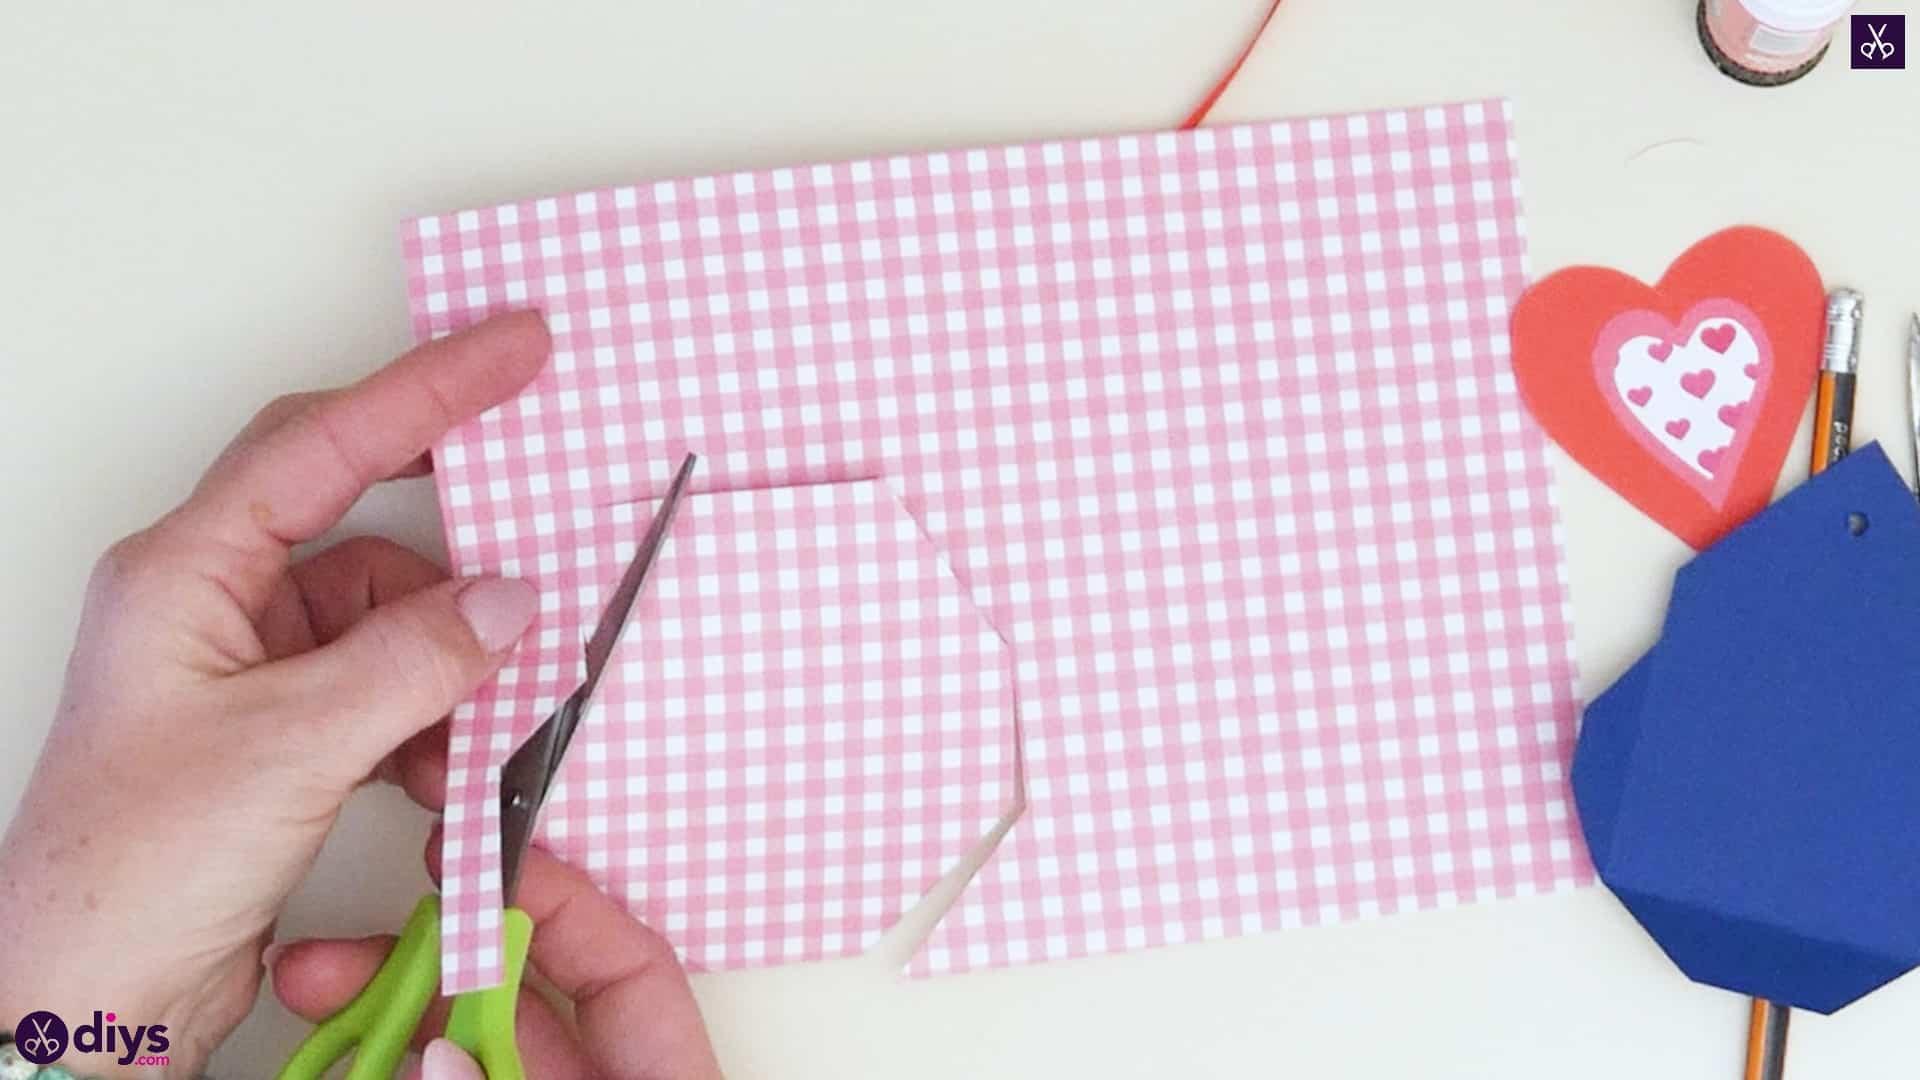 Diy pocketed gift tags step 4b